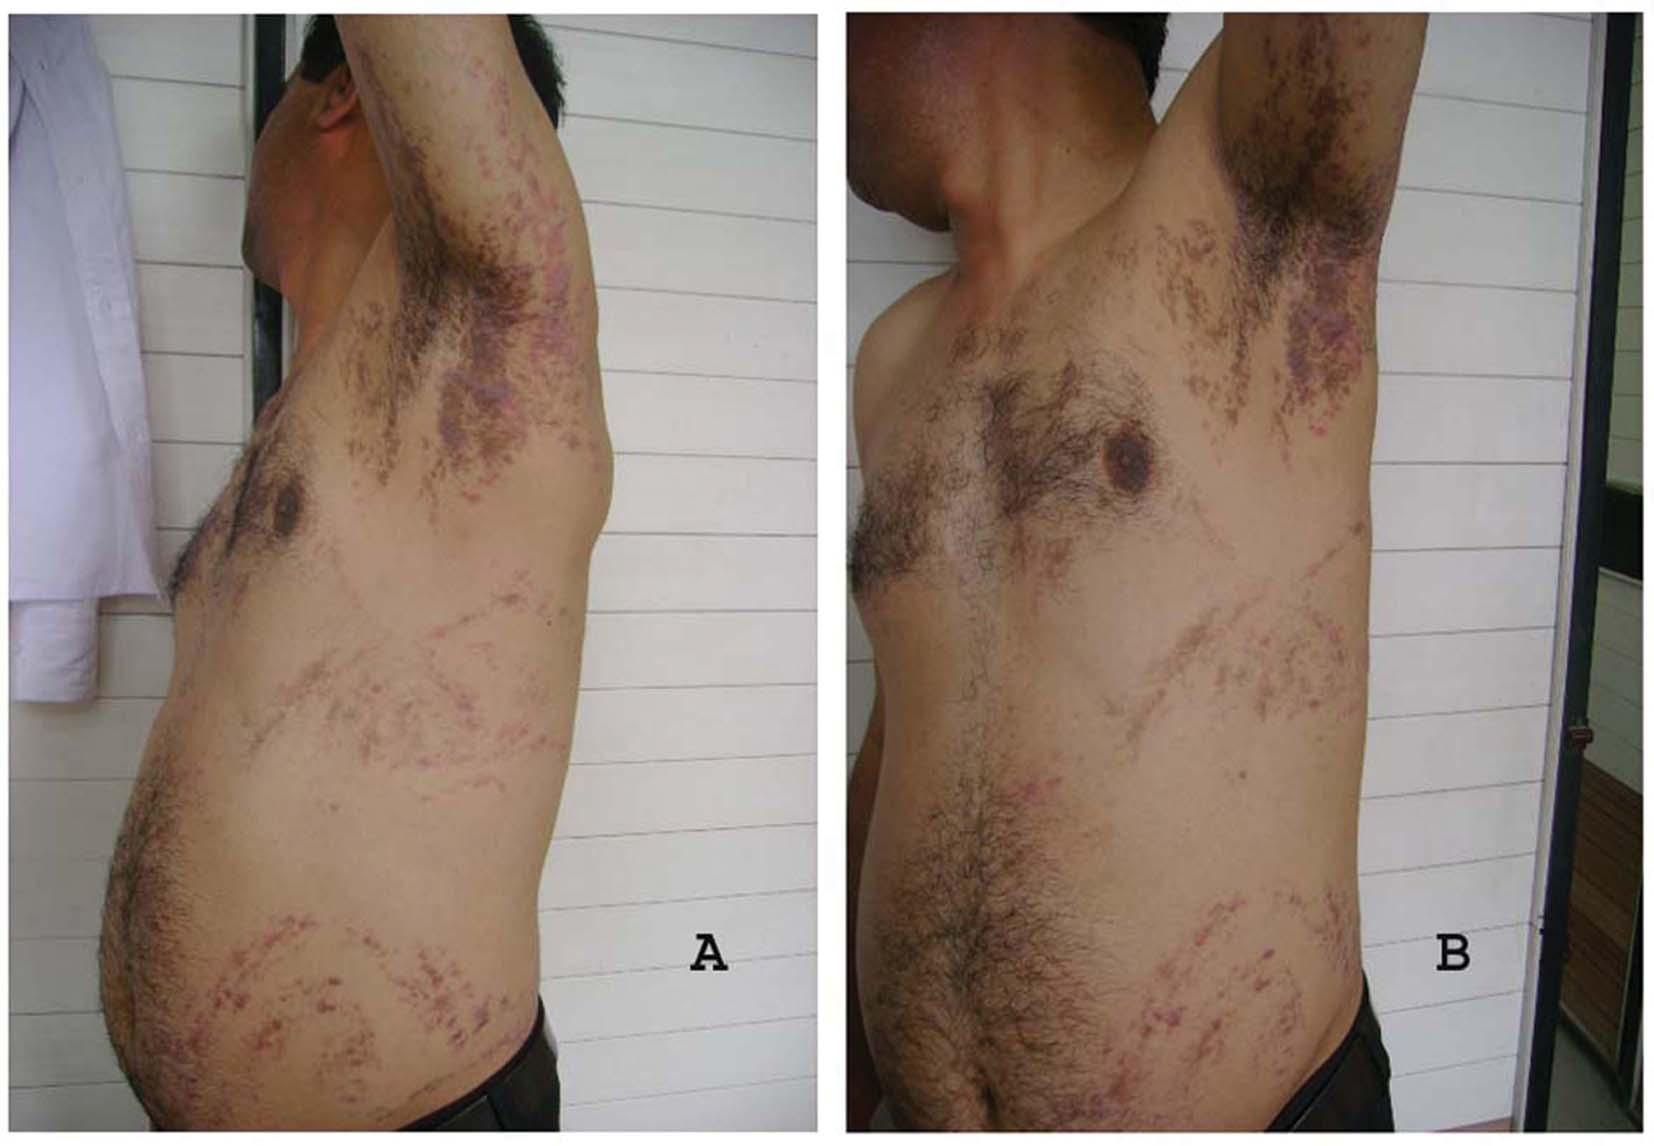 inflammatory pruritic manifestations corticosteroid responsive dermatoses